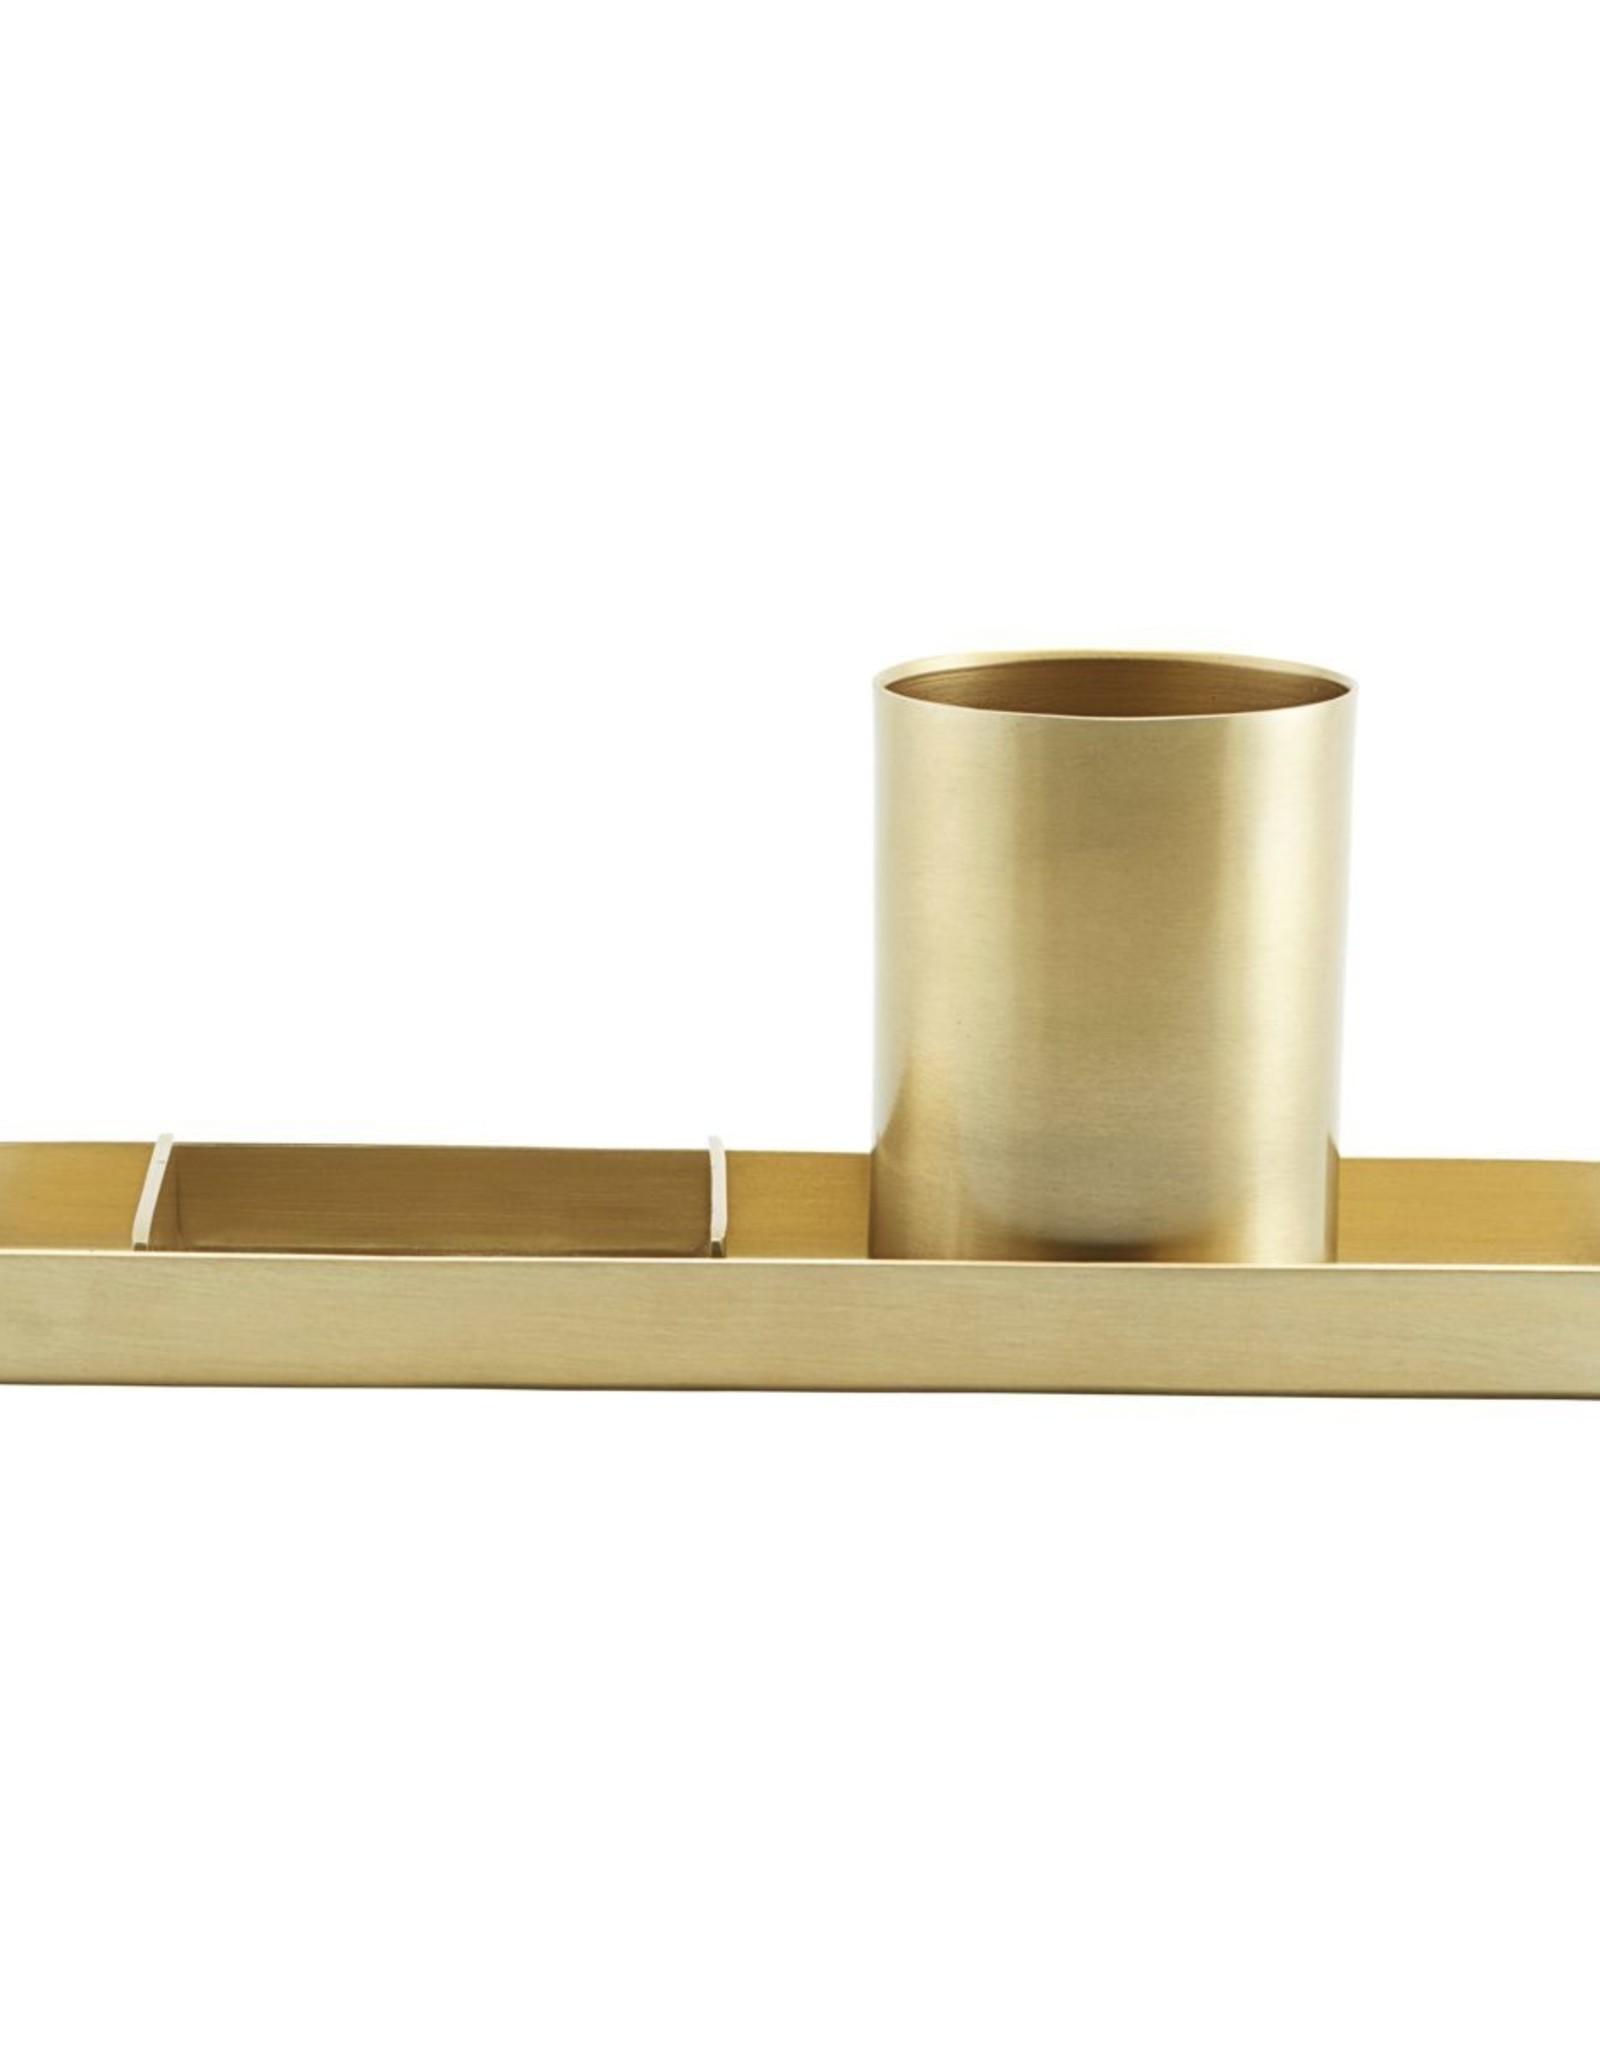 Monograph Monograph Stationary organizer set of 3  brass finish, 26.6 x 9 cm, h: 10 cm